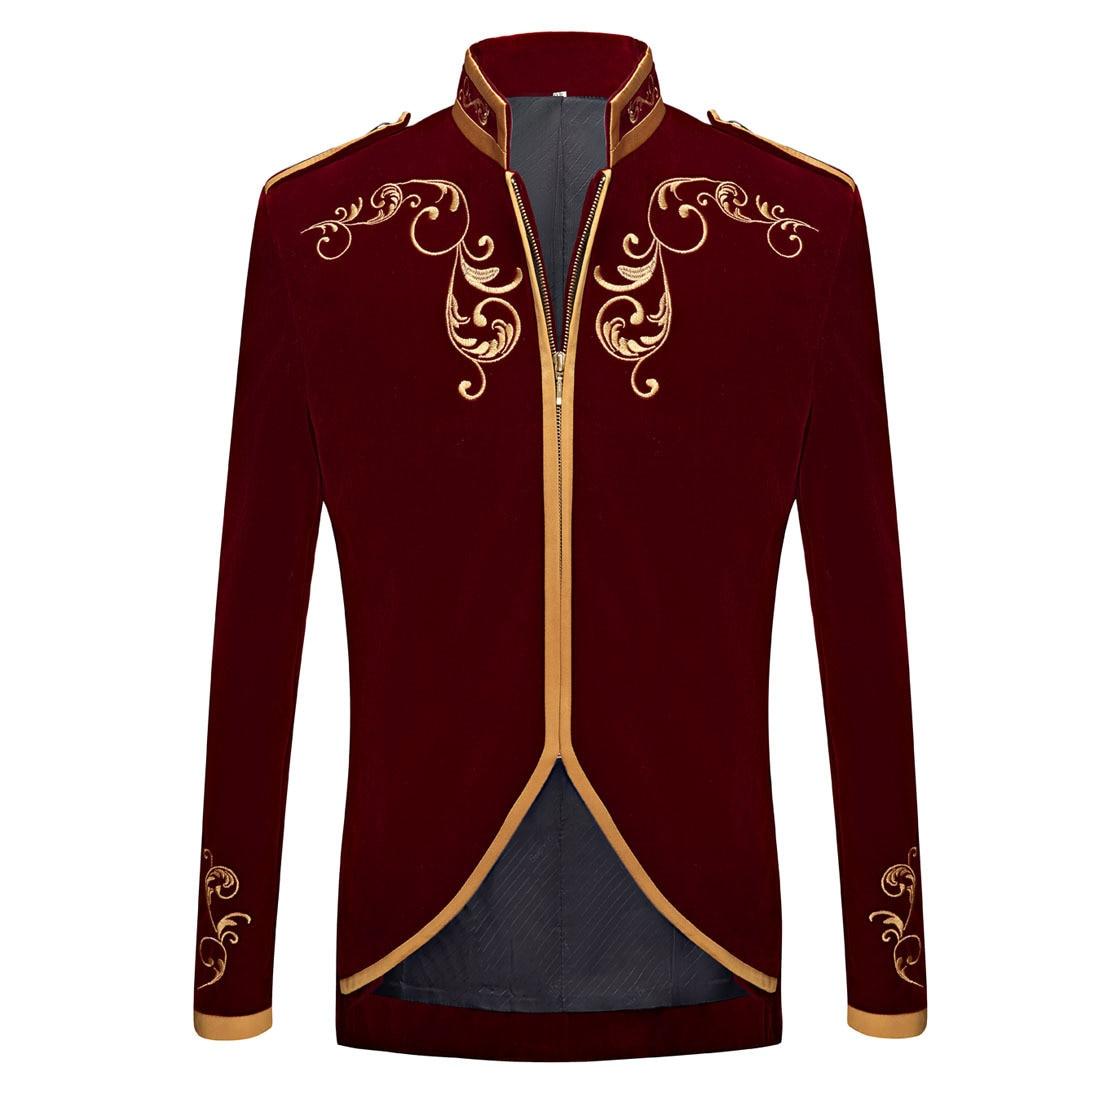 Pyjtrl casaco jaqueta preta de veludo, estilo